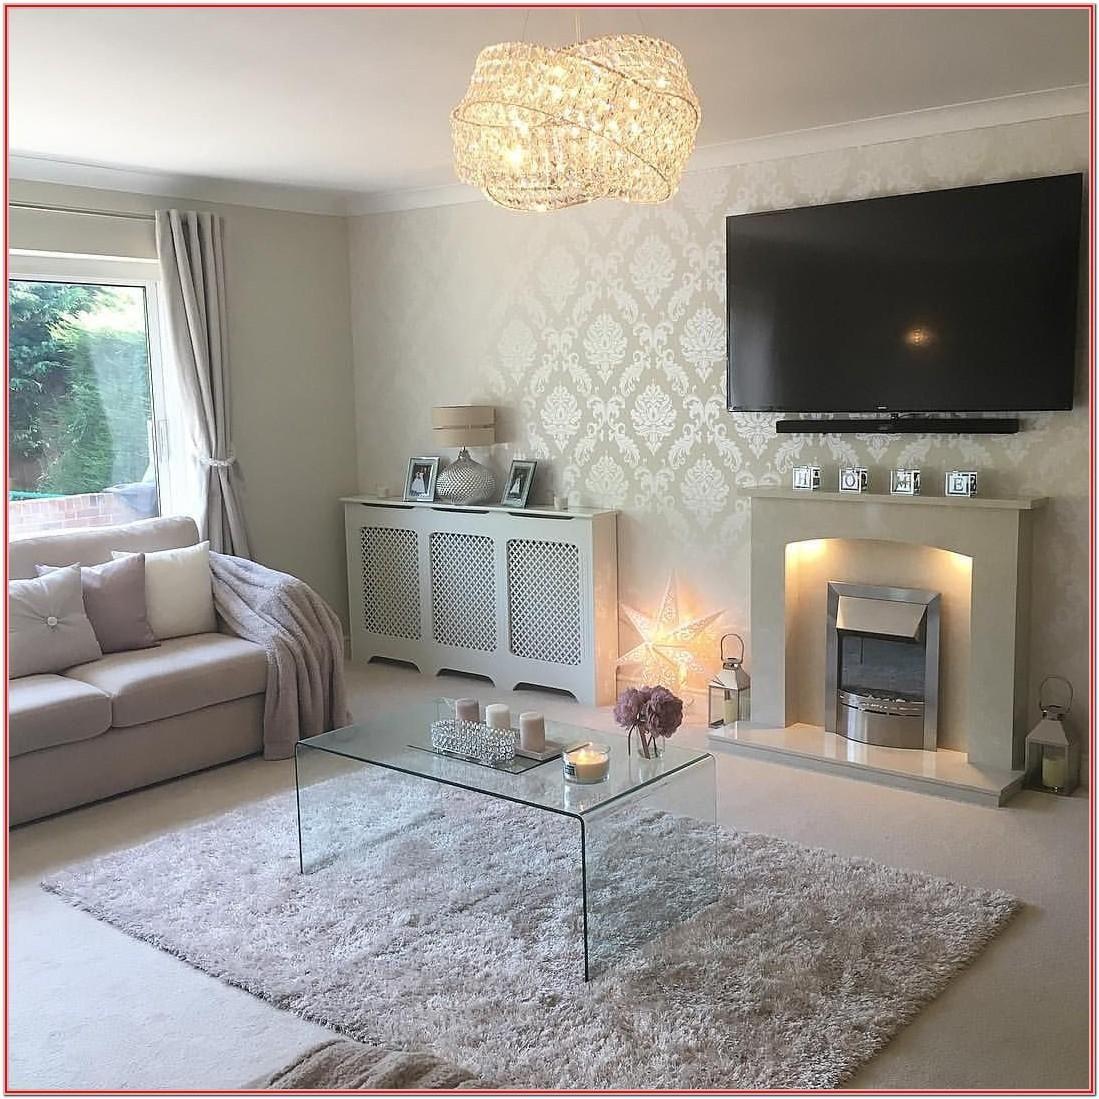 Wallpaper Design Ideas For Living Room Elegant Living Room Elegant Living Room Wallpaper Room Wallpaper Designs